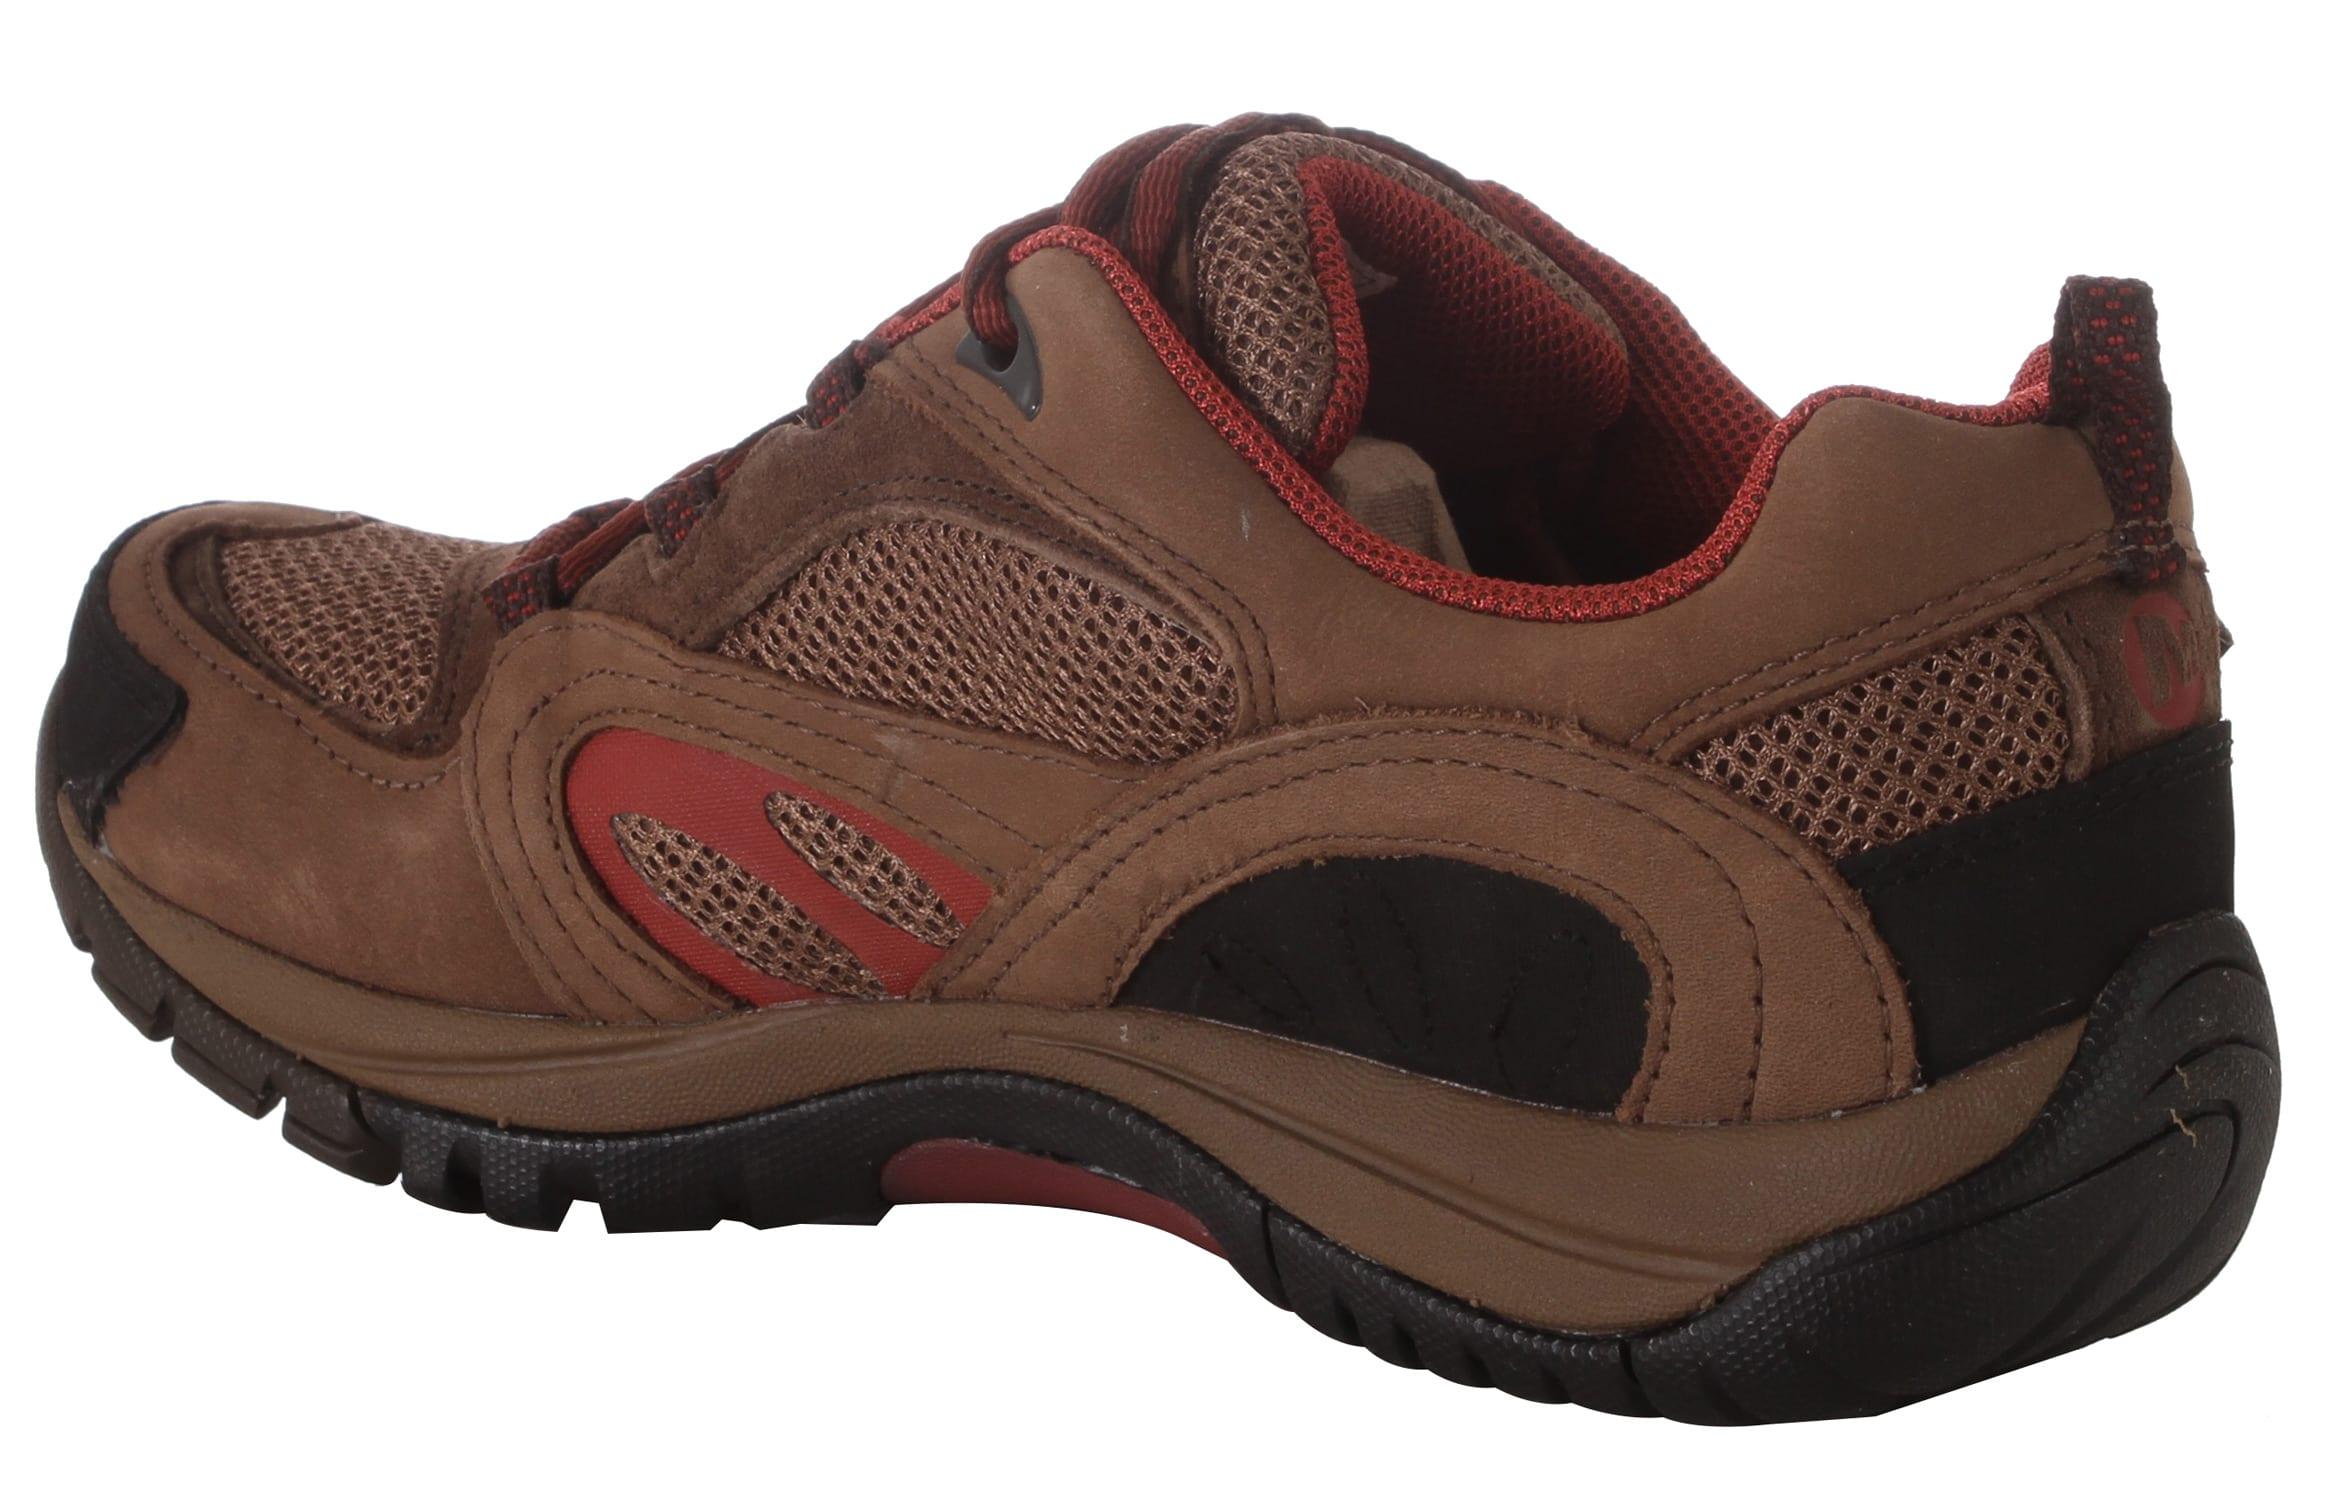 On Sale Merrell Azura Waterproof Hiking Shoes - Womens up ...